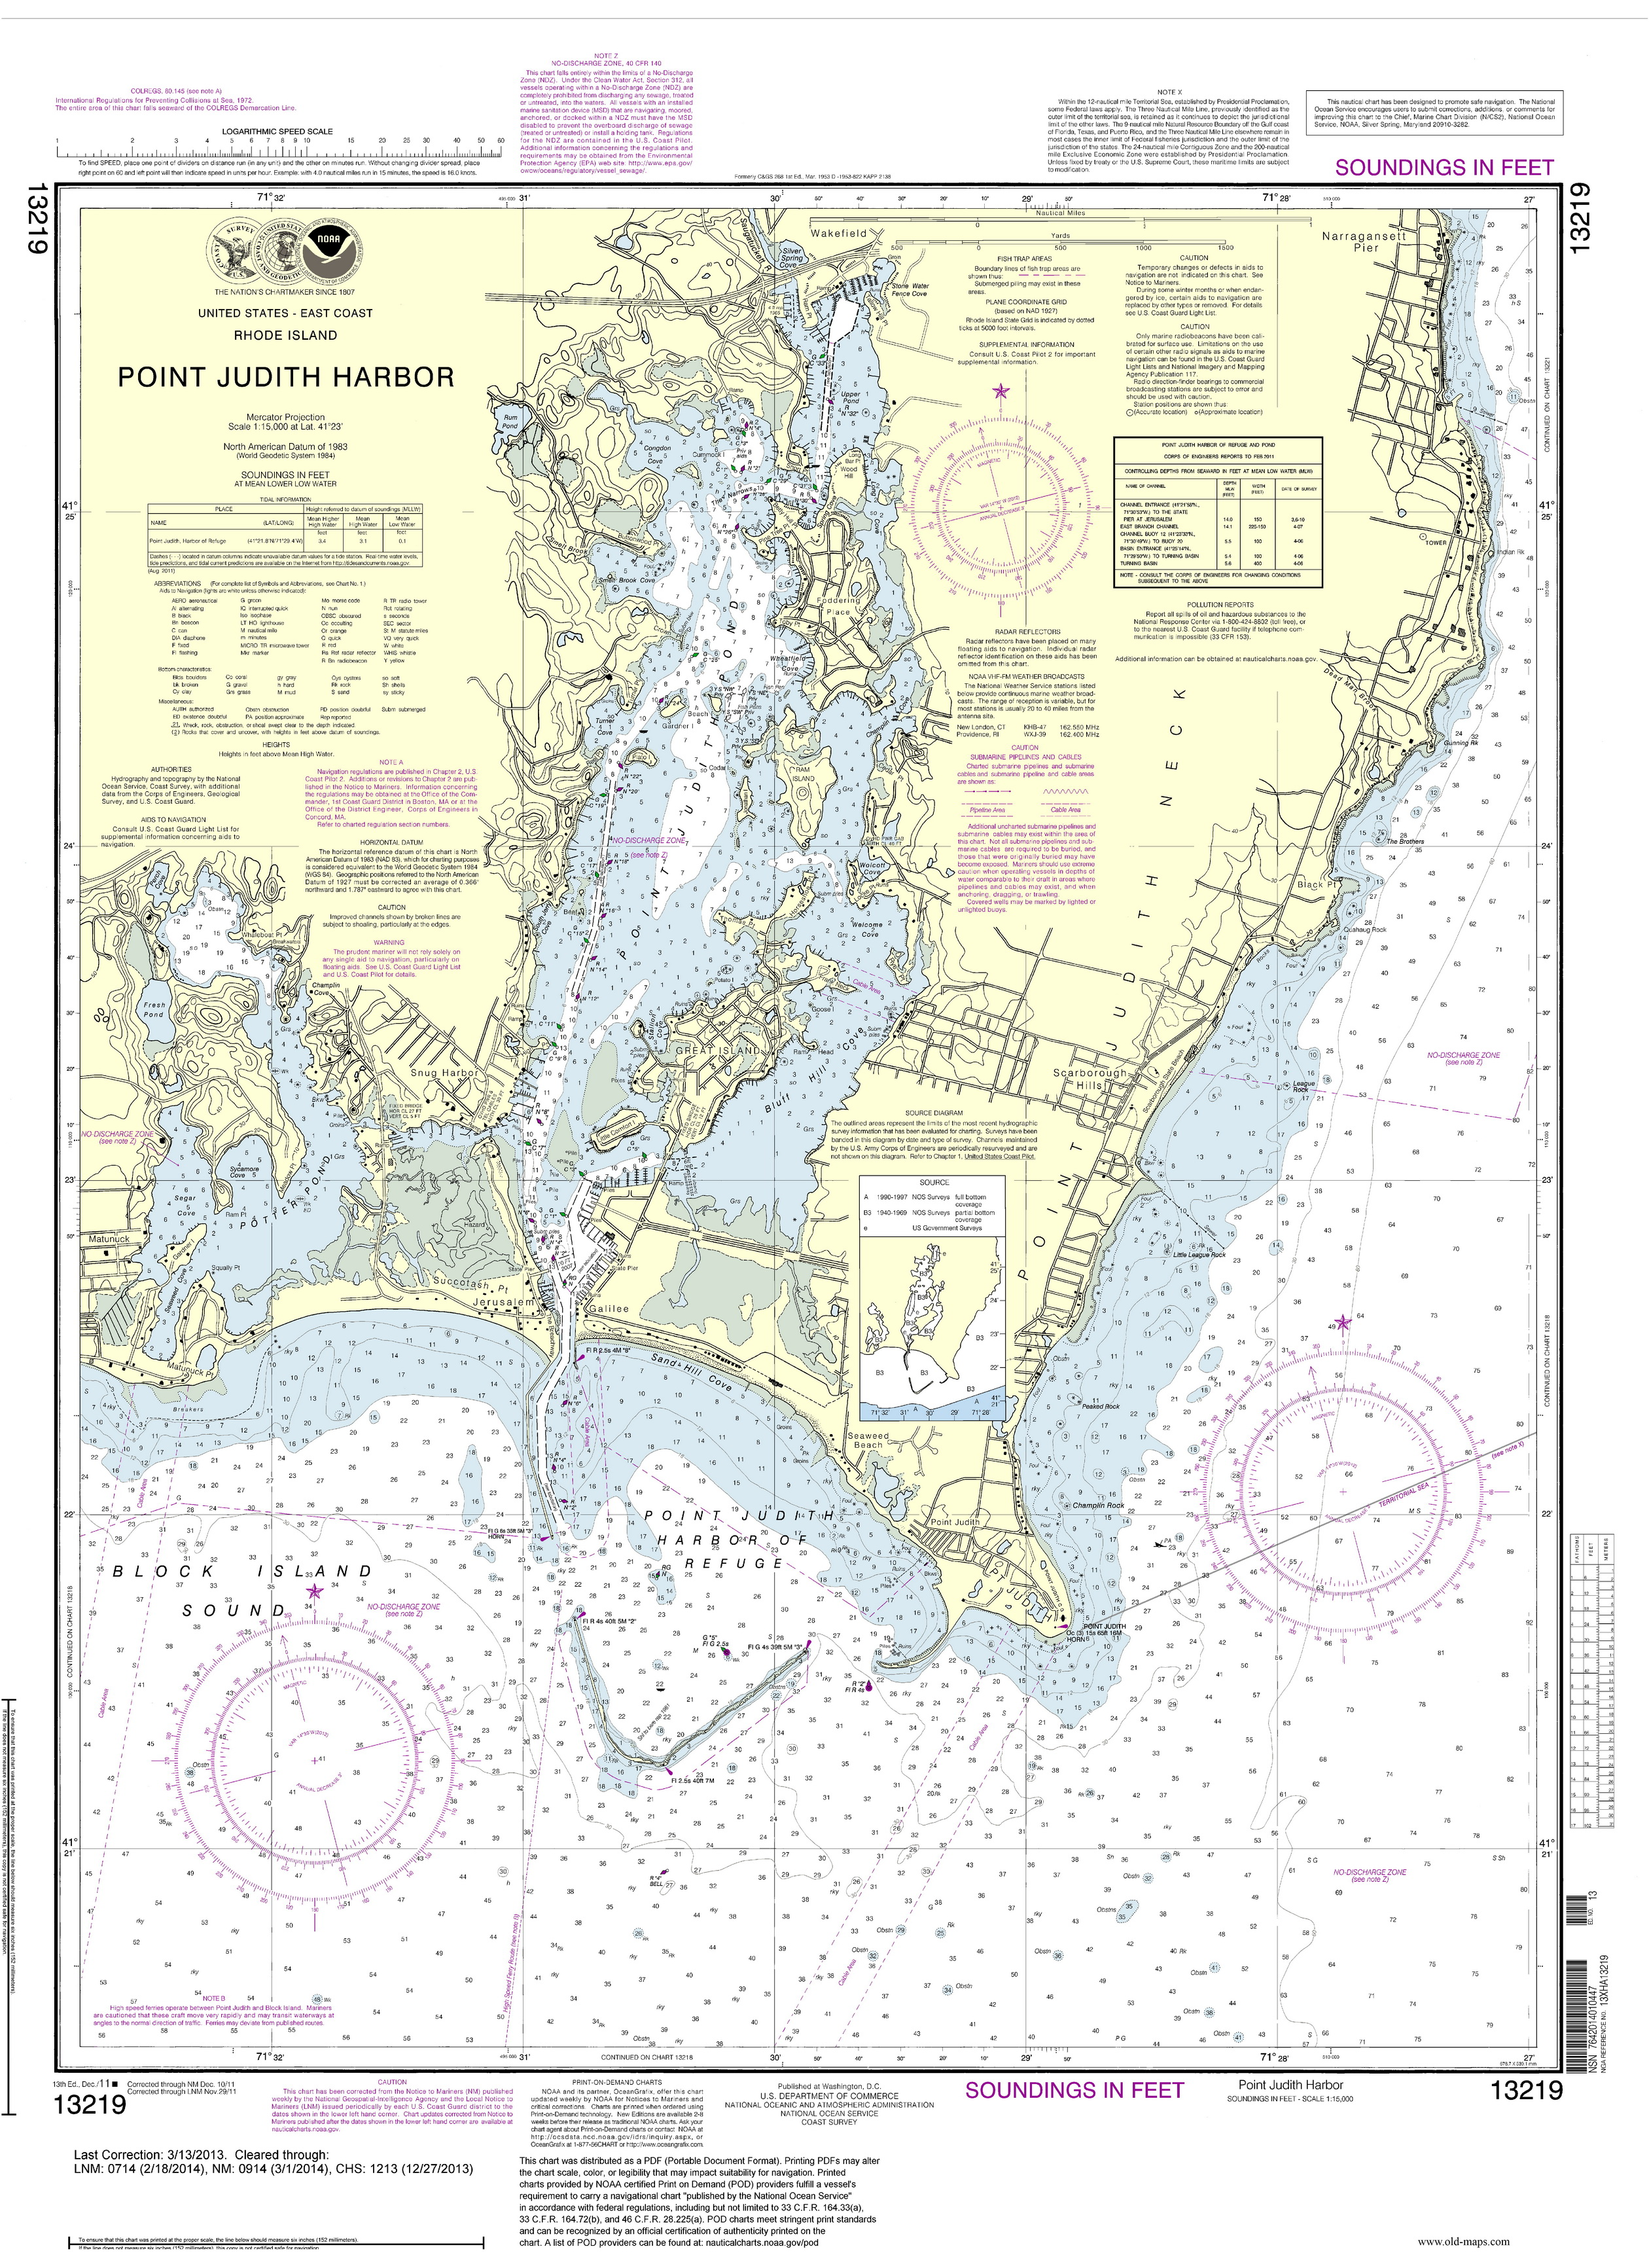 2013 Nautical Maps of Rhode Island